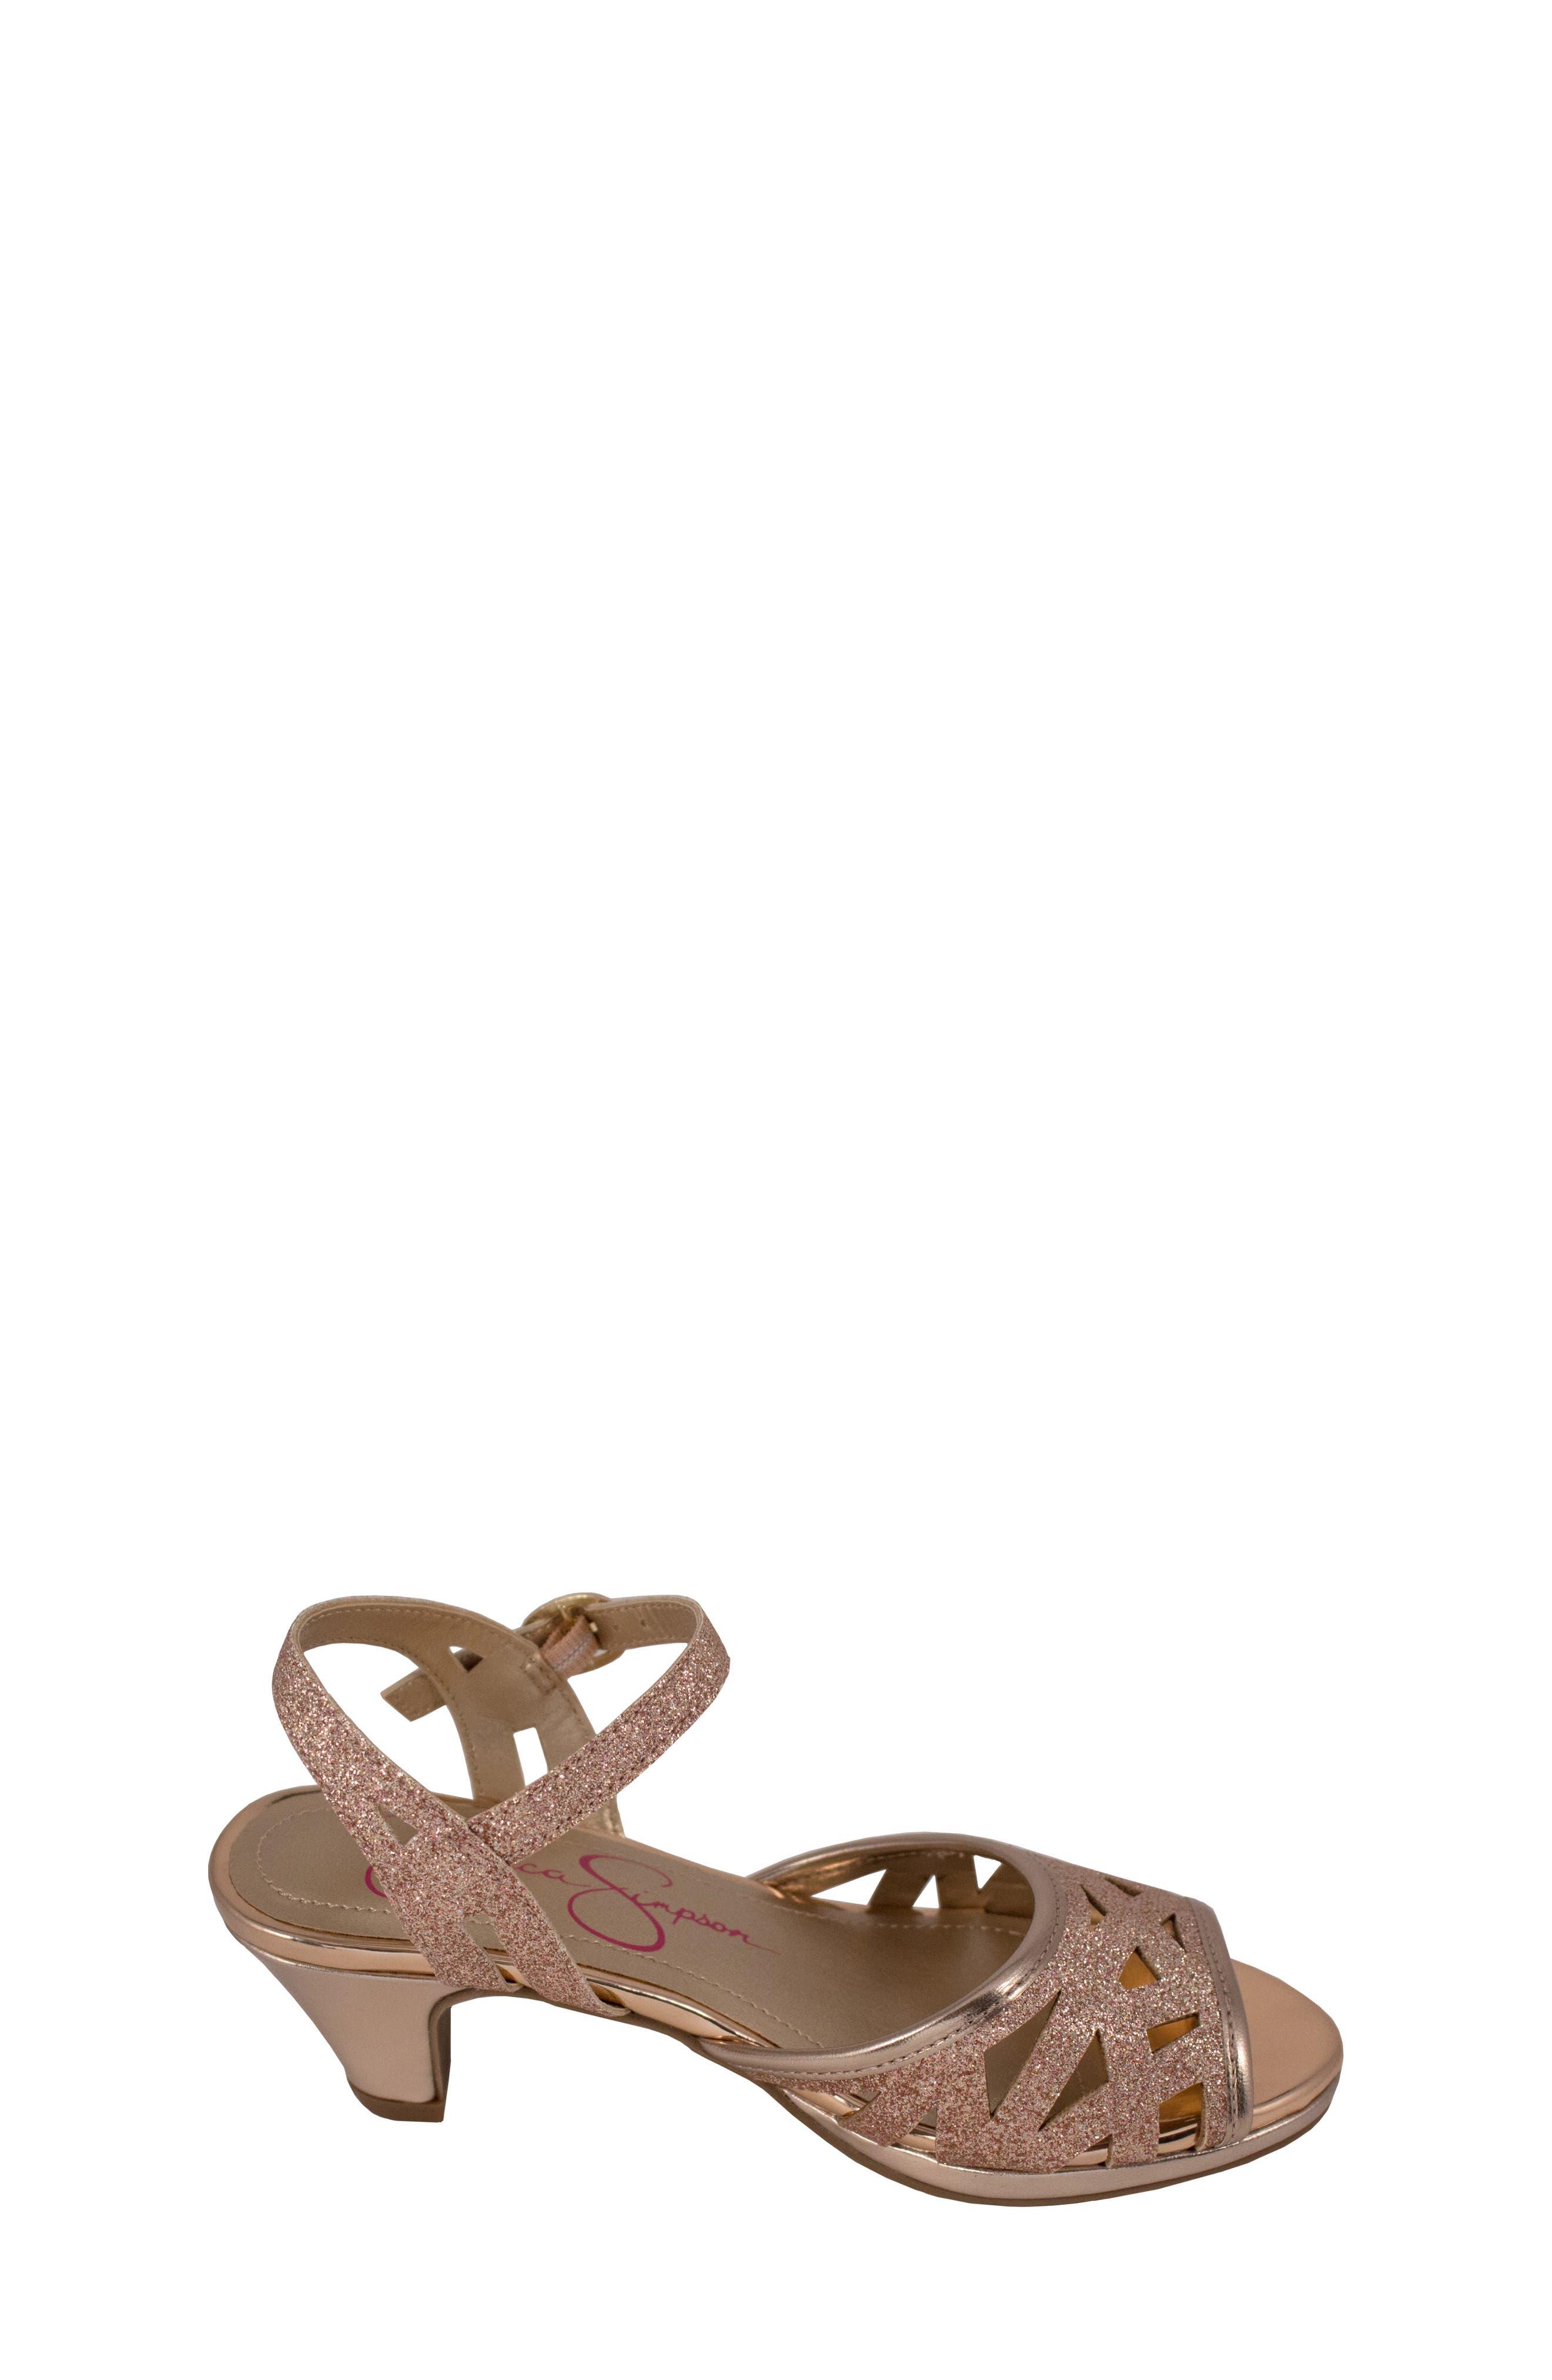 JESSICA SIMPSON,                             Glitter Sandal,                             Alternate thumbnail 3, color,                             ROSE GOLD